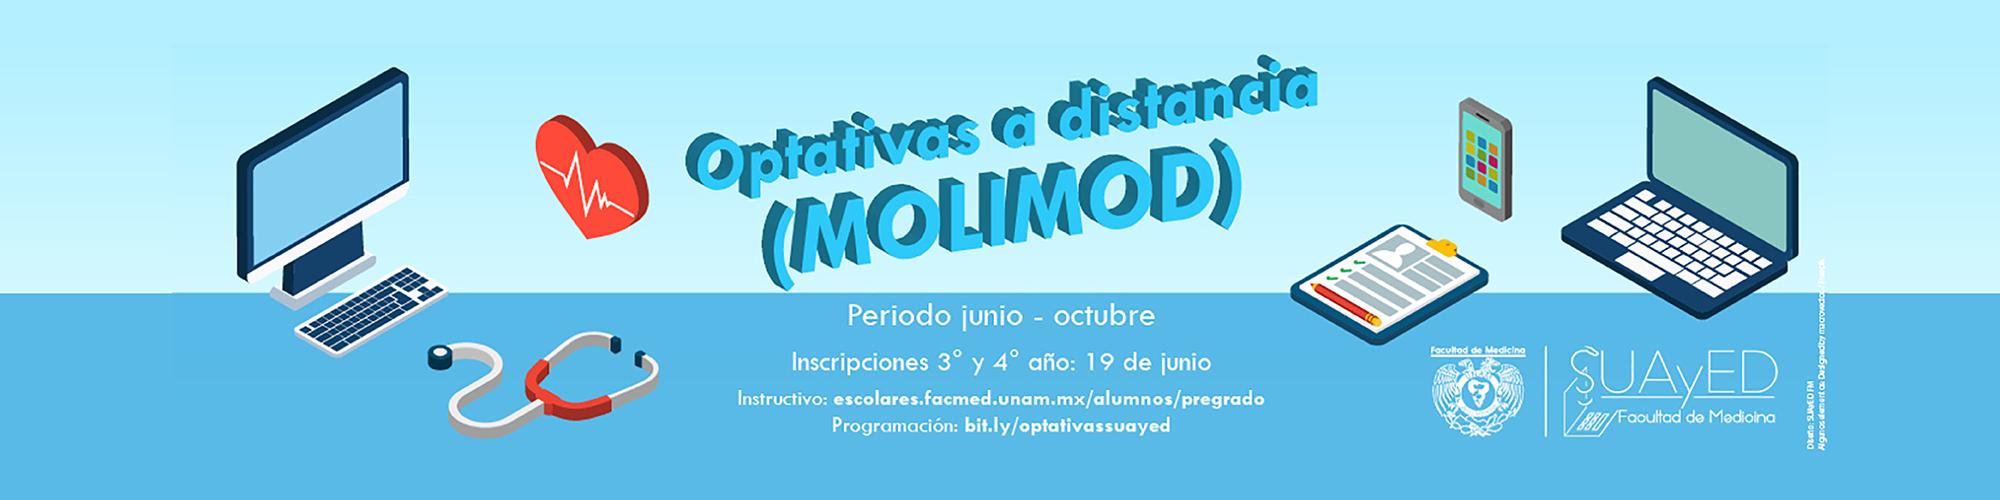 MOLIMOD